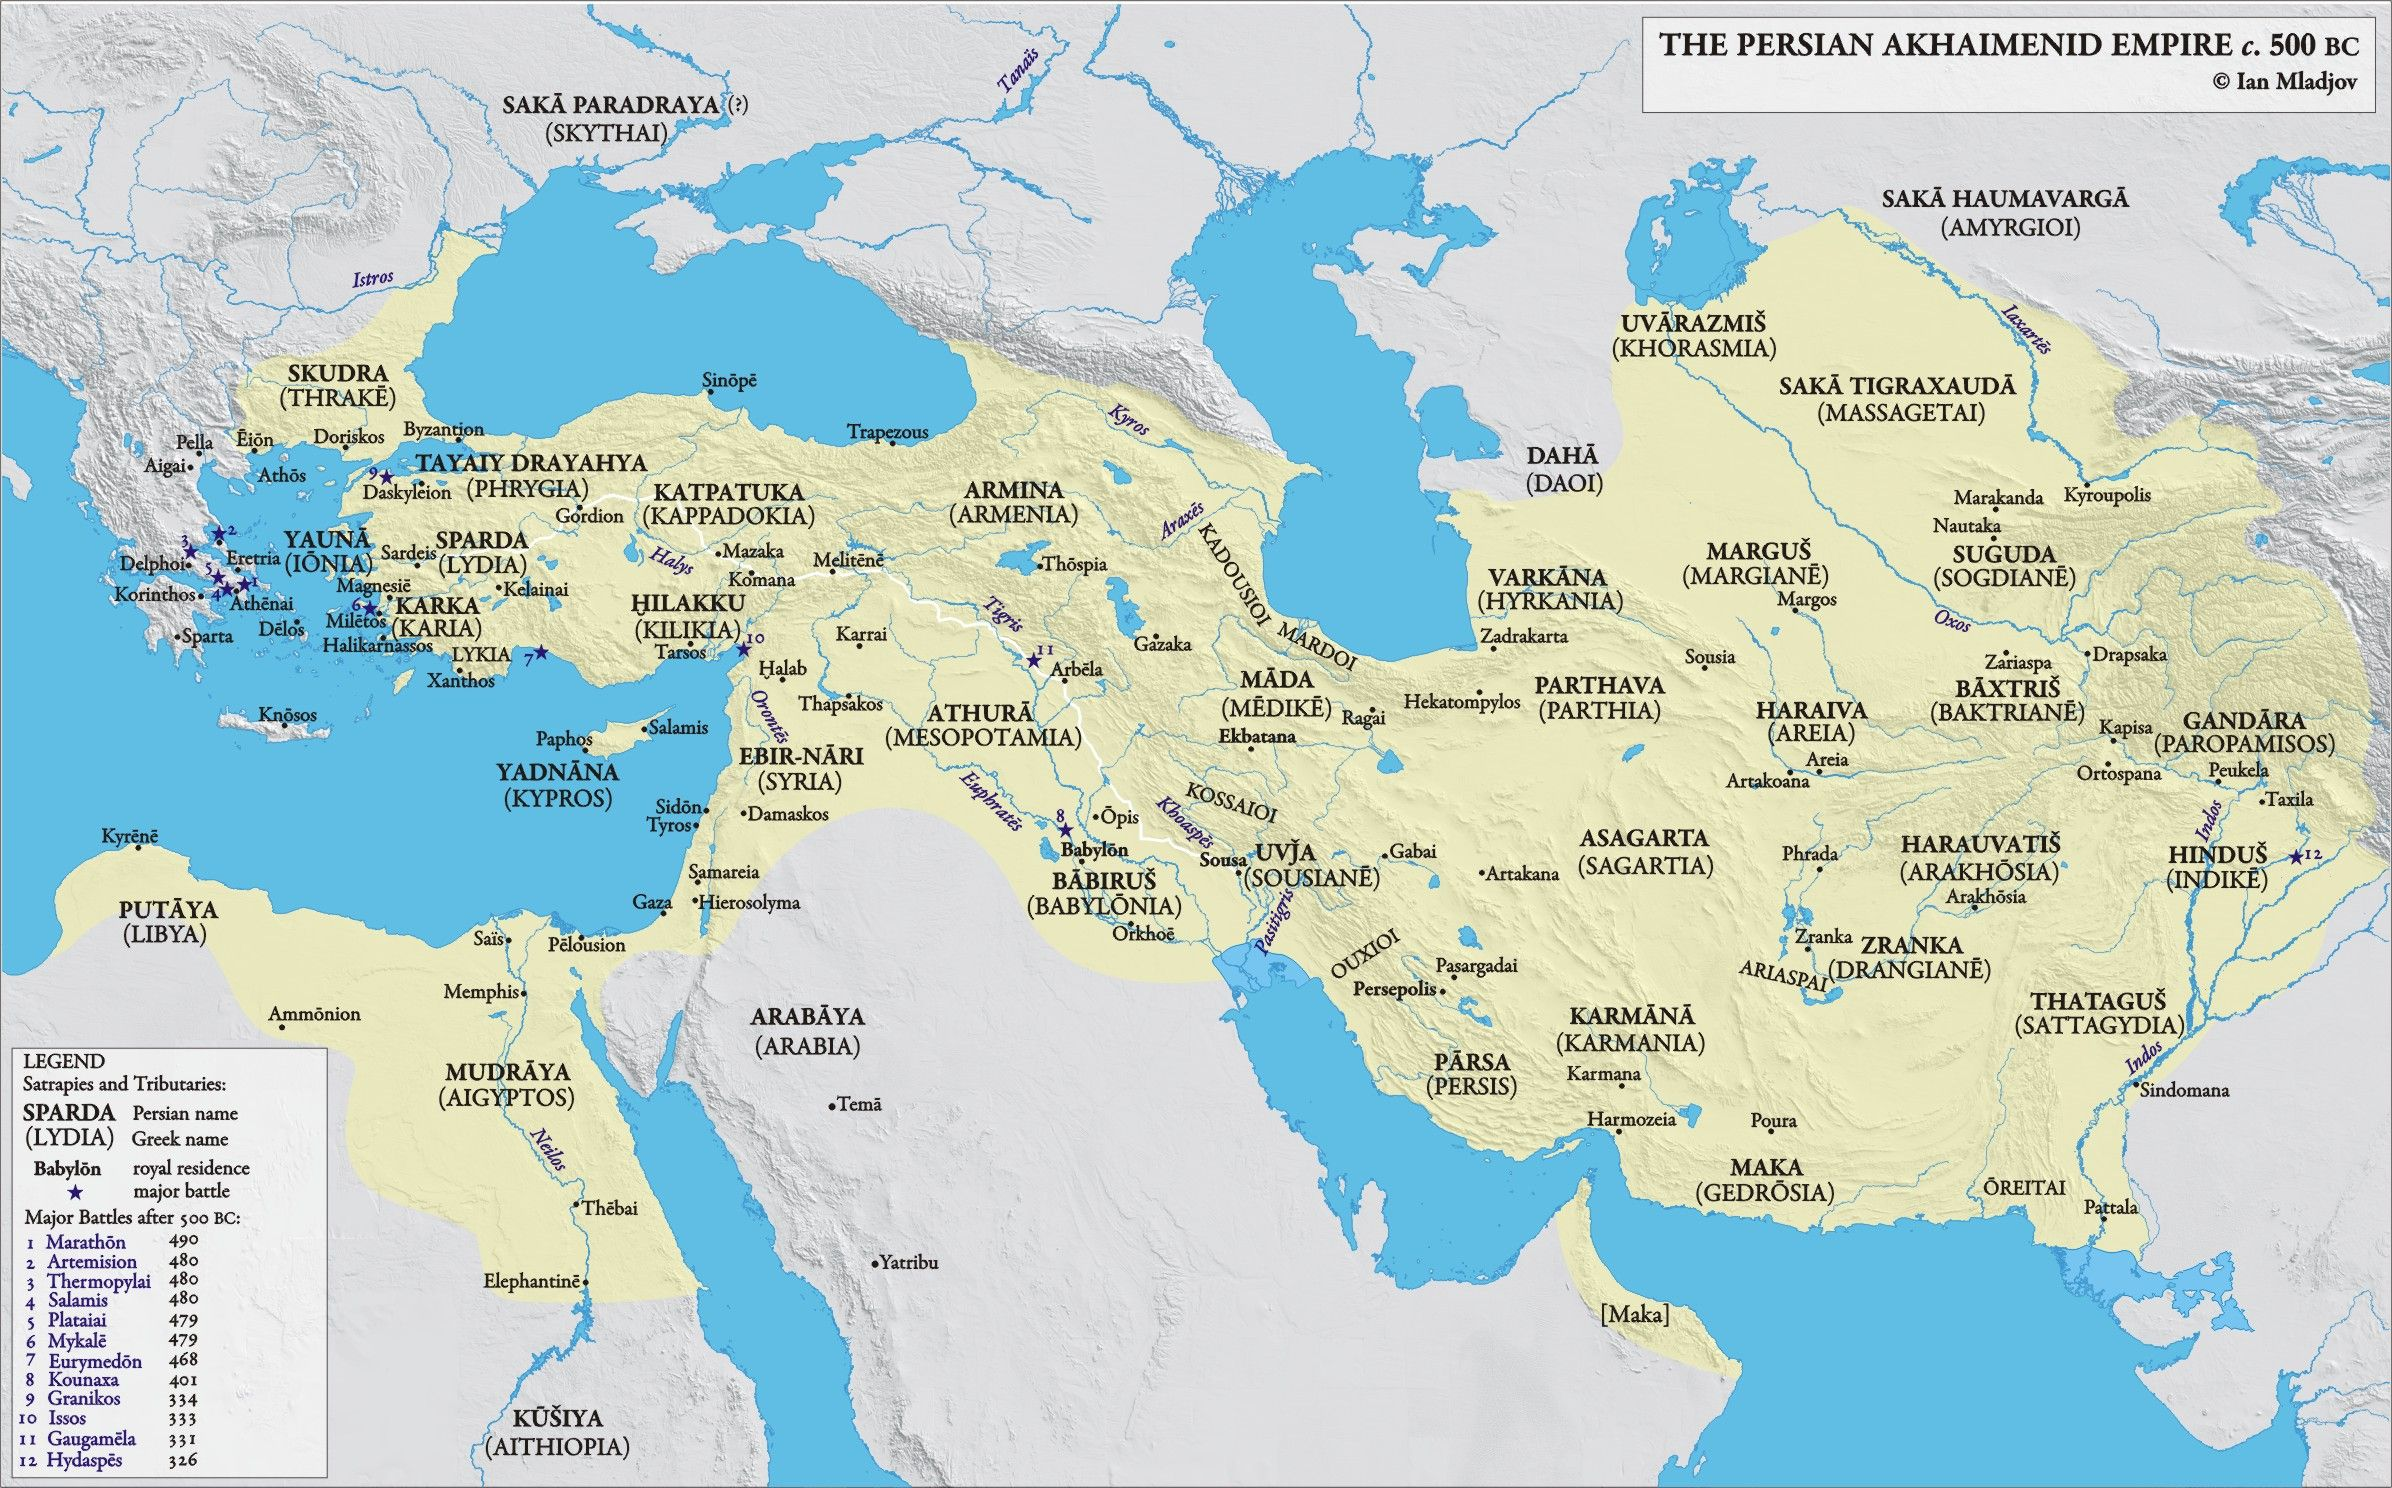 Persian Empire 500 BC | Persian empire map, Empire, Achaemenid